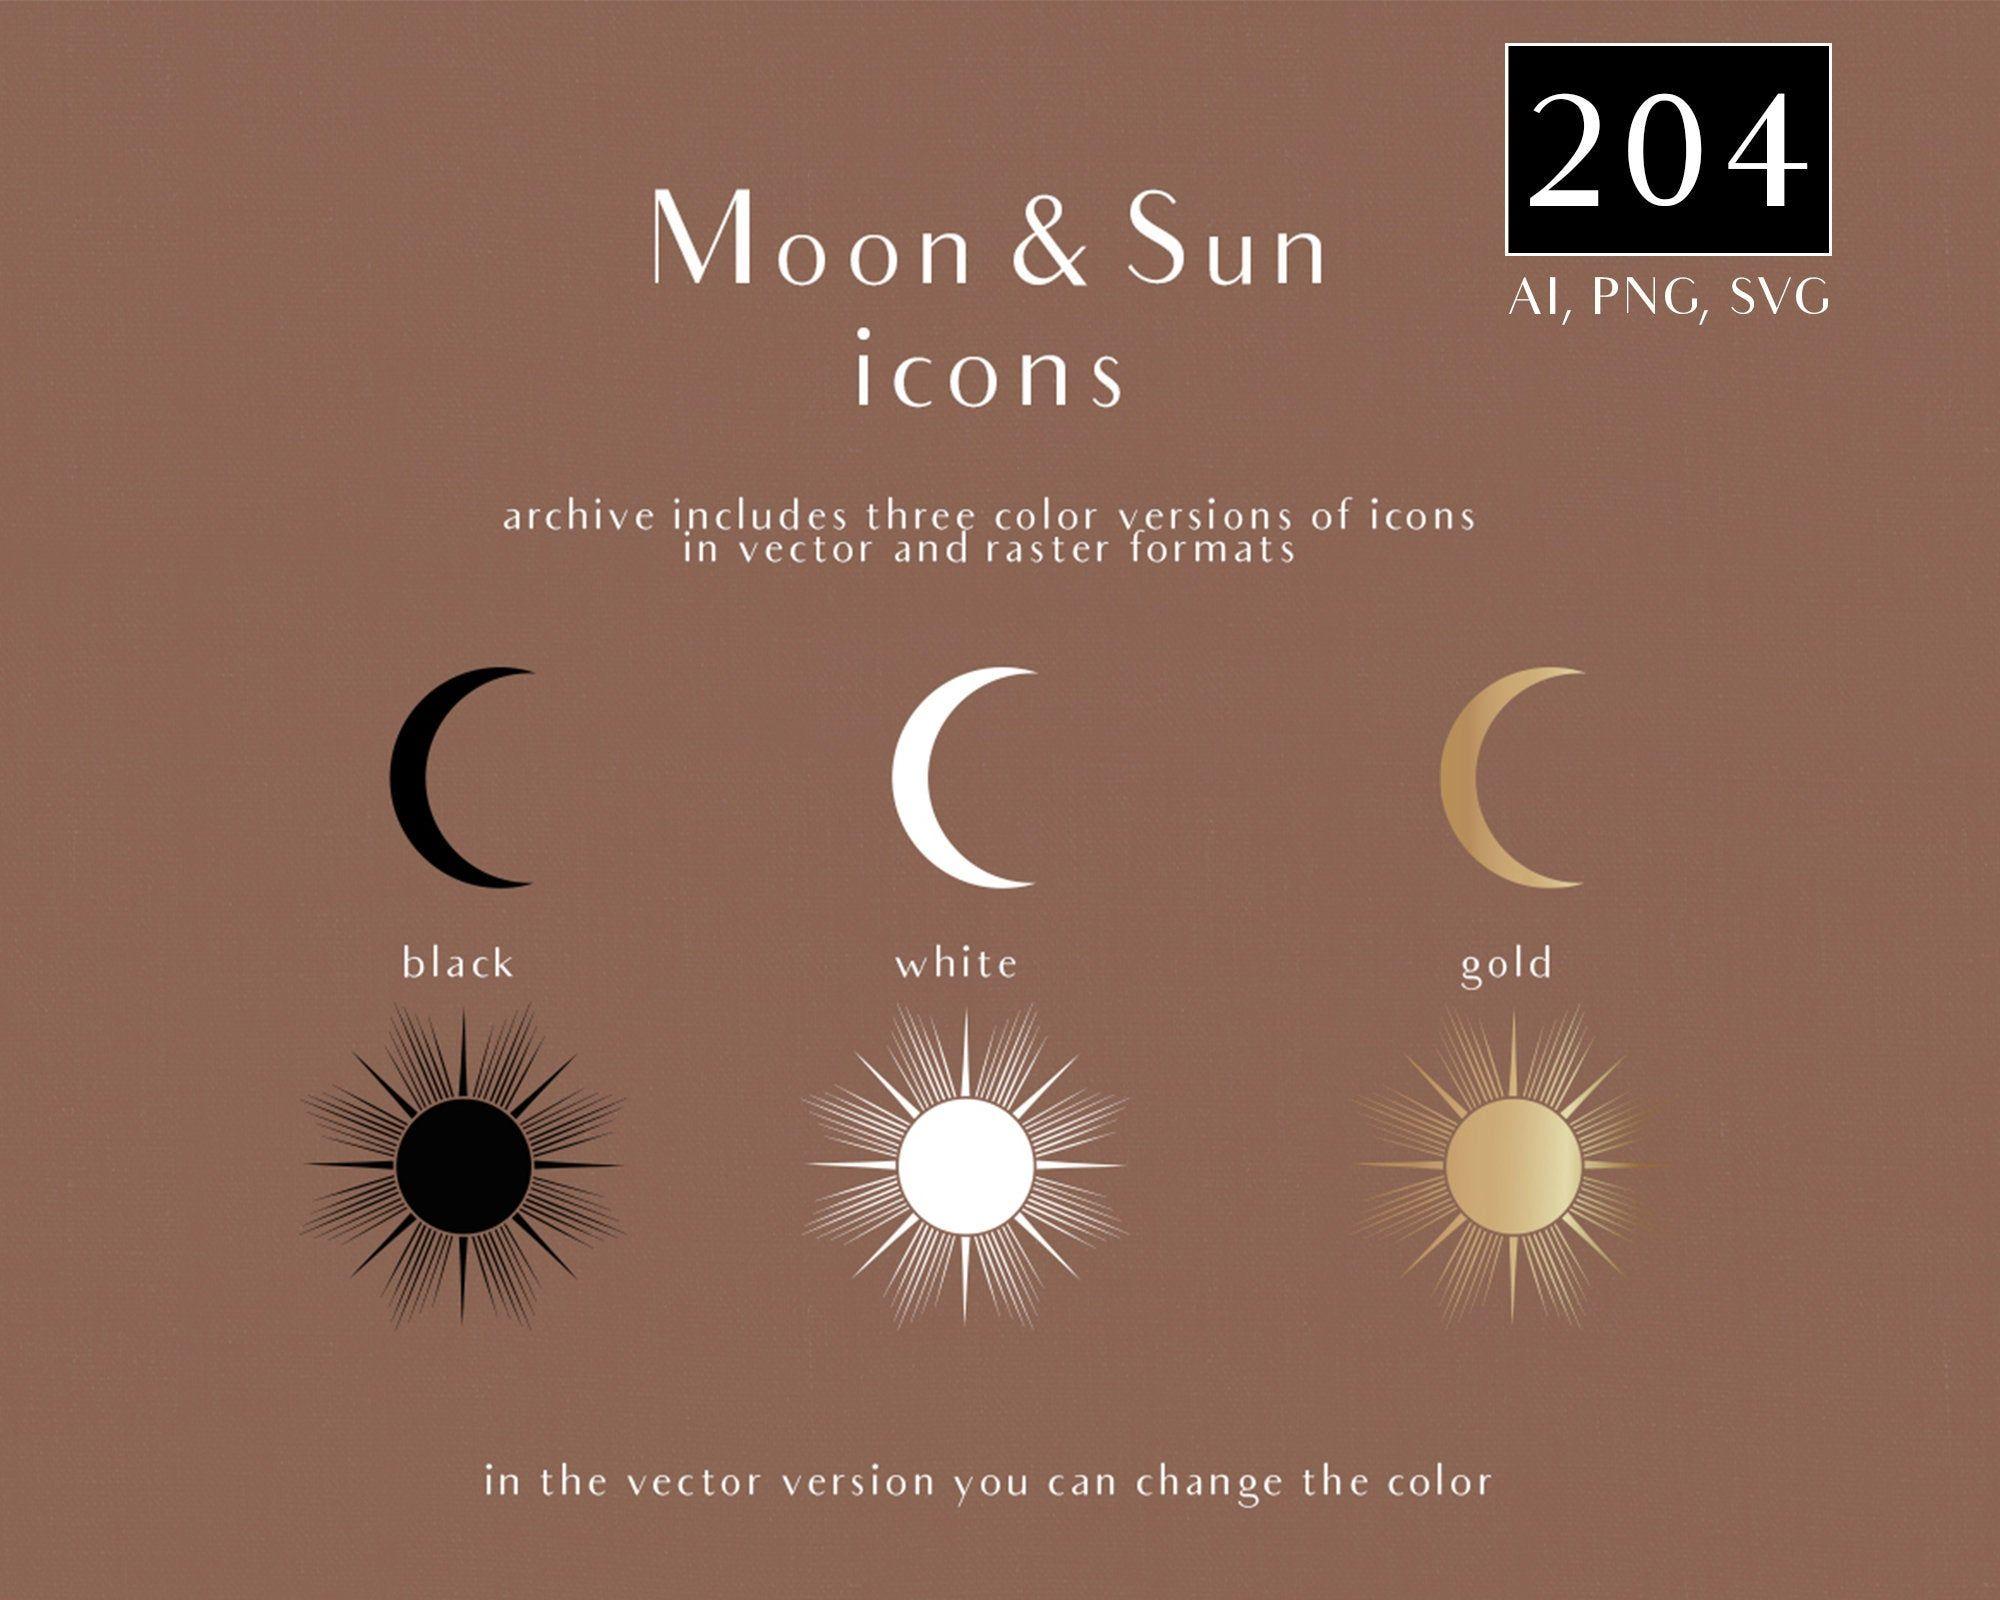 Moon And Sun Icons Moon And Sun Logos Png Svg Clipart In Etsy Disney Konsept Sanati Konsept Sanati Sanat